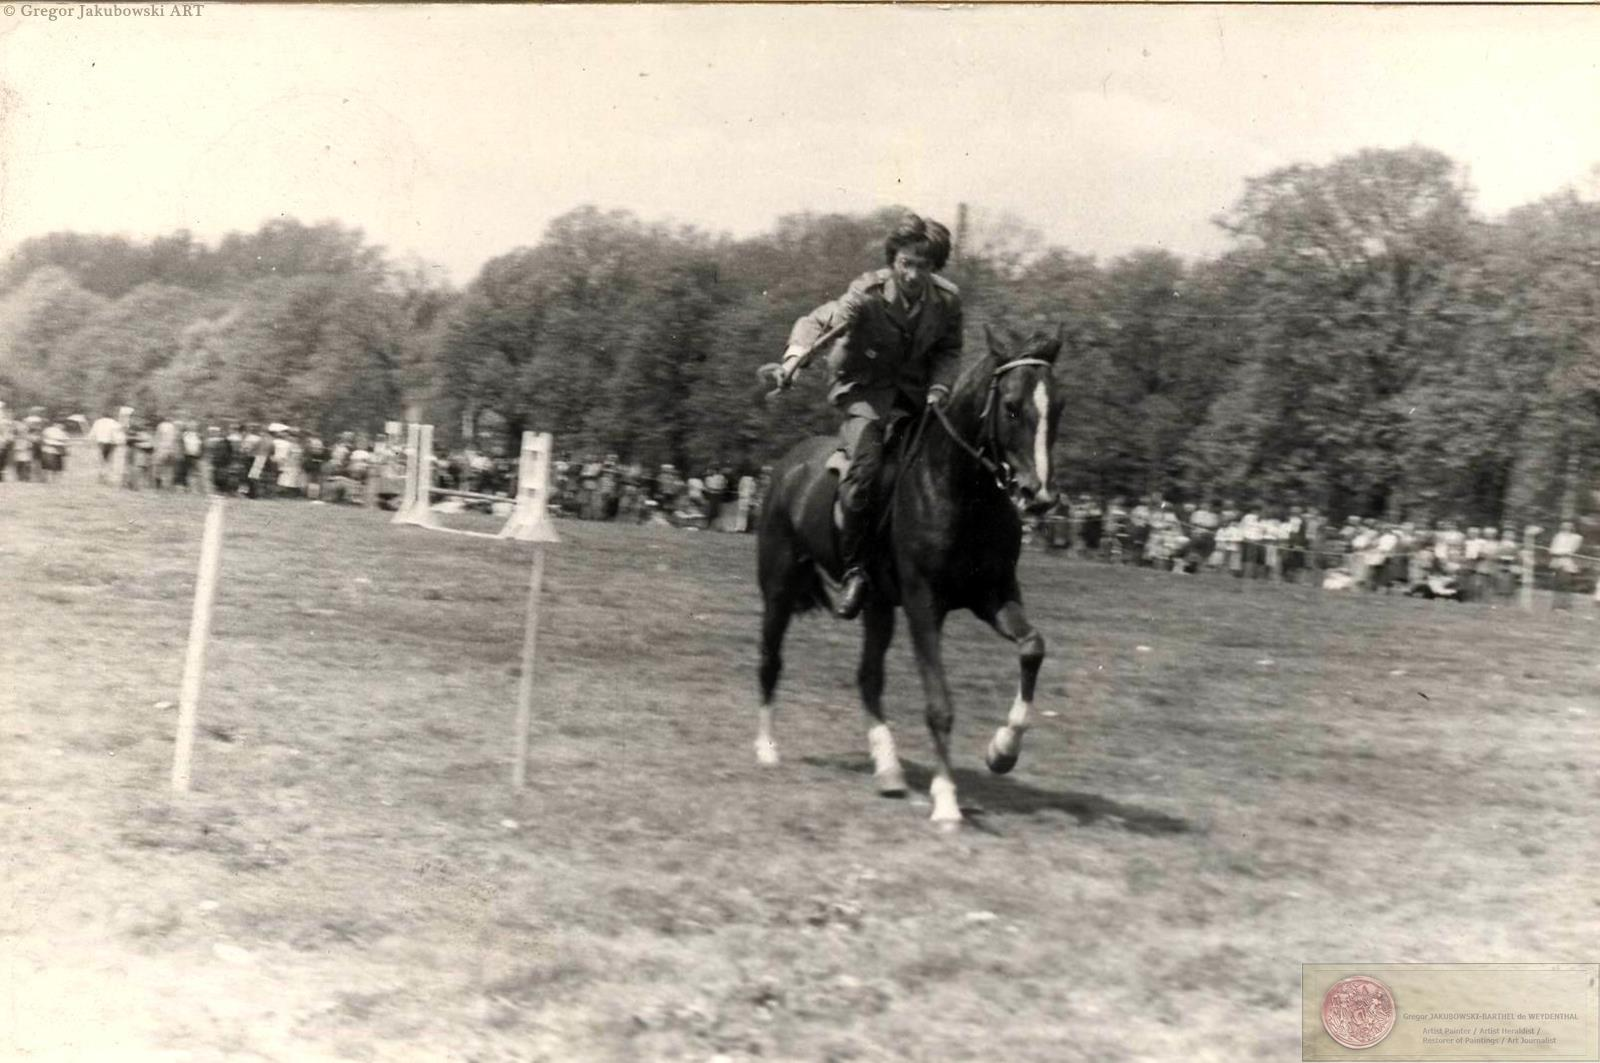 GJ_WKKU_Krakow_Blonia_1980